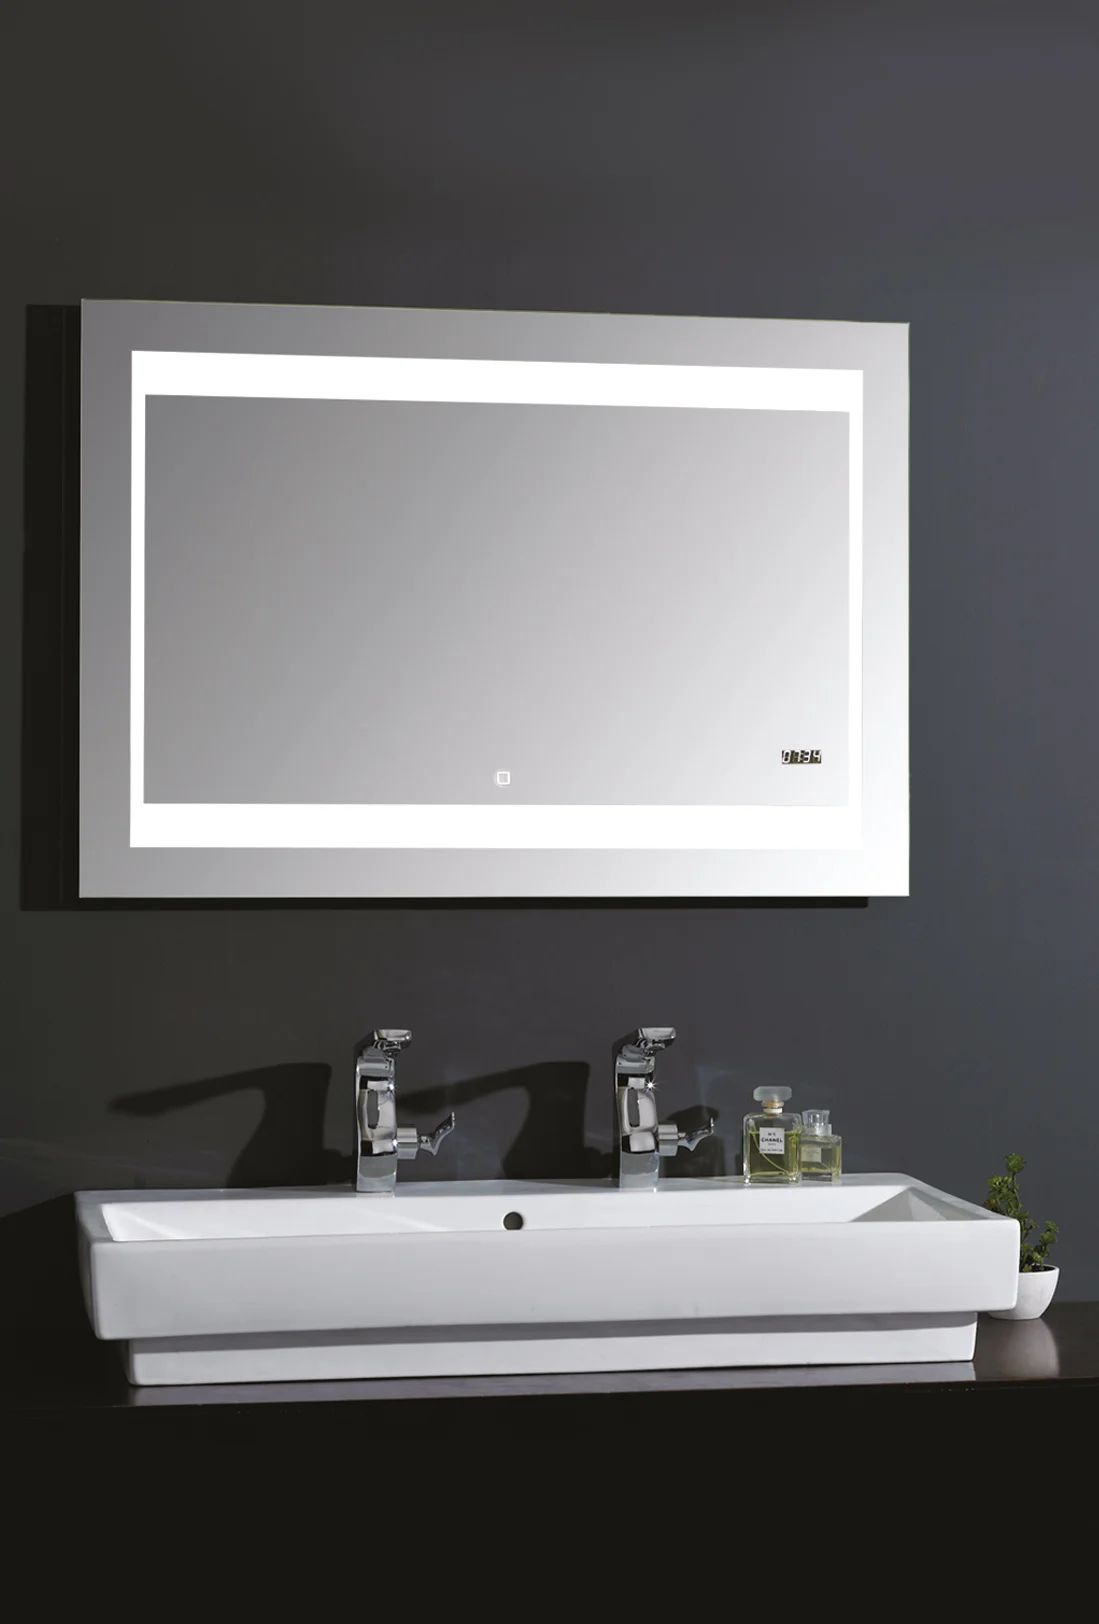 Miroir Lumineux Avec Eclairage Integre L 140 X H 70 Cm Silver Futura Leroy Merlin